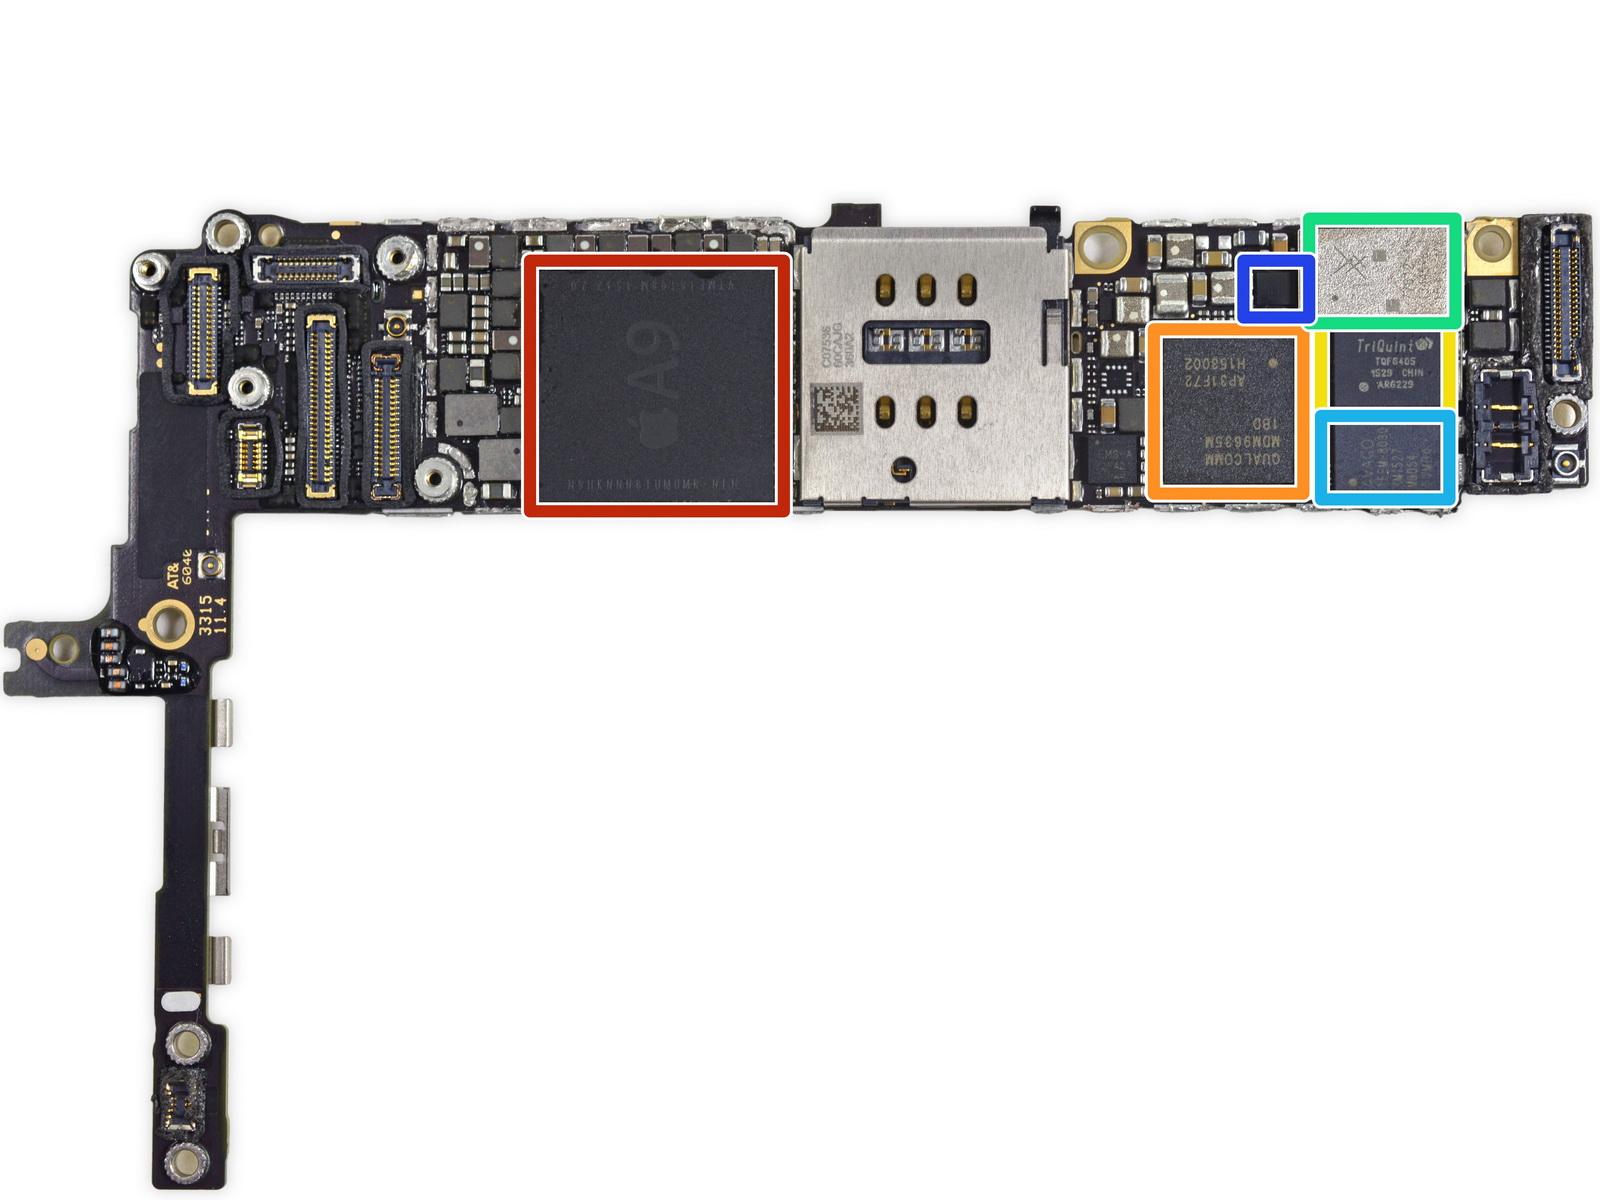 new concept 948a3 54826 Apple iPhone 6s Plus gets the teardown treatment - NotebookCheck.net ...